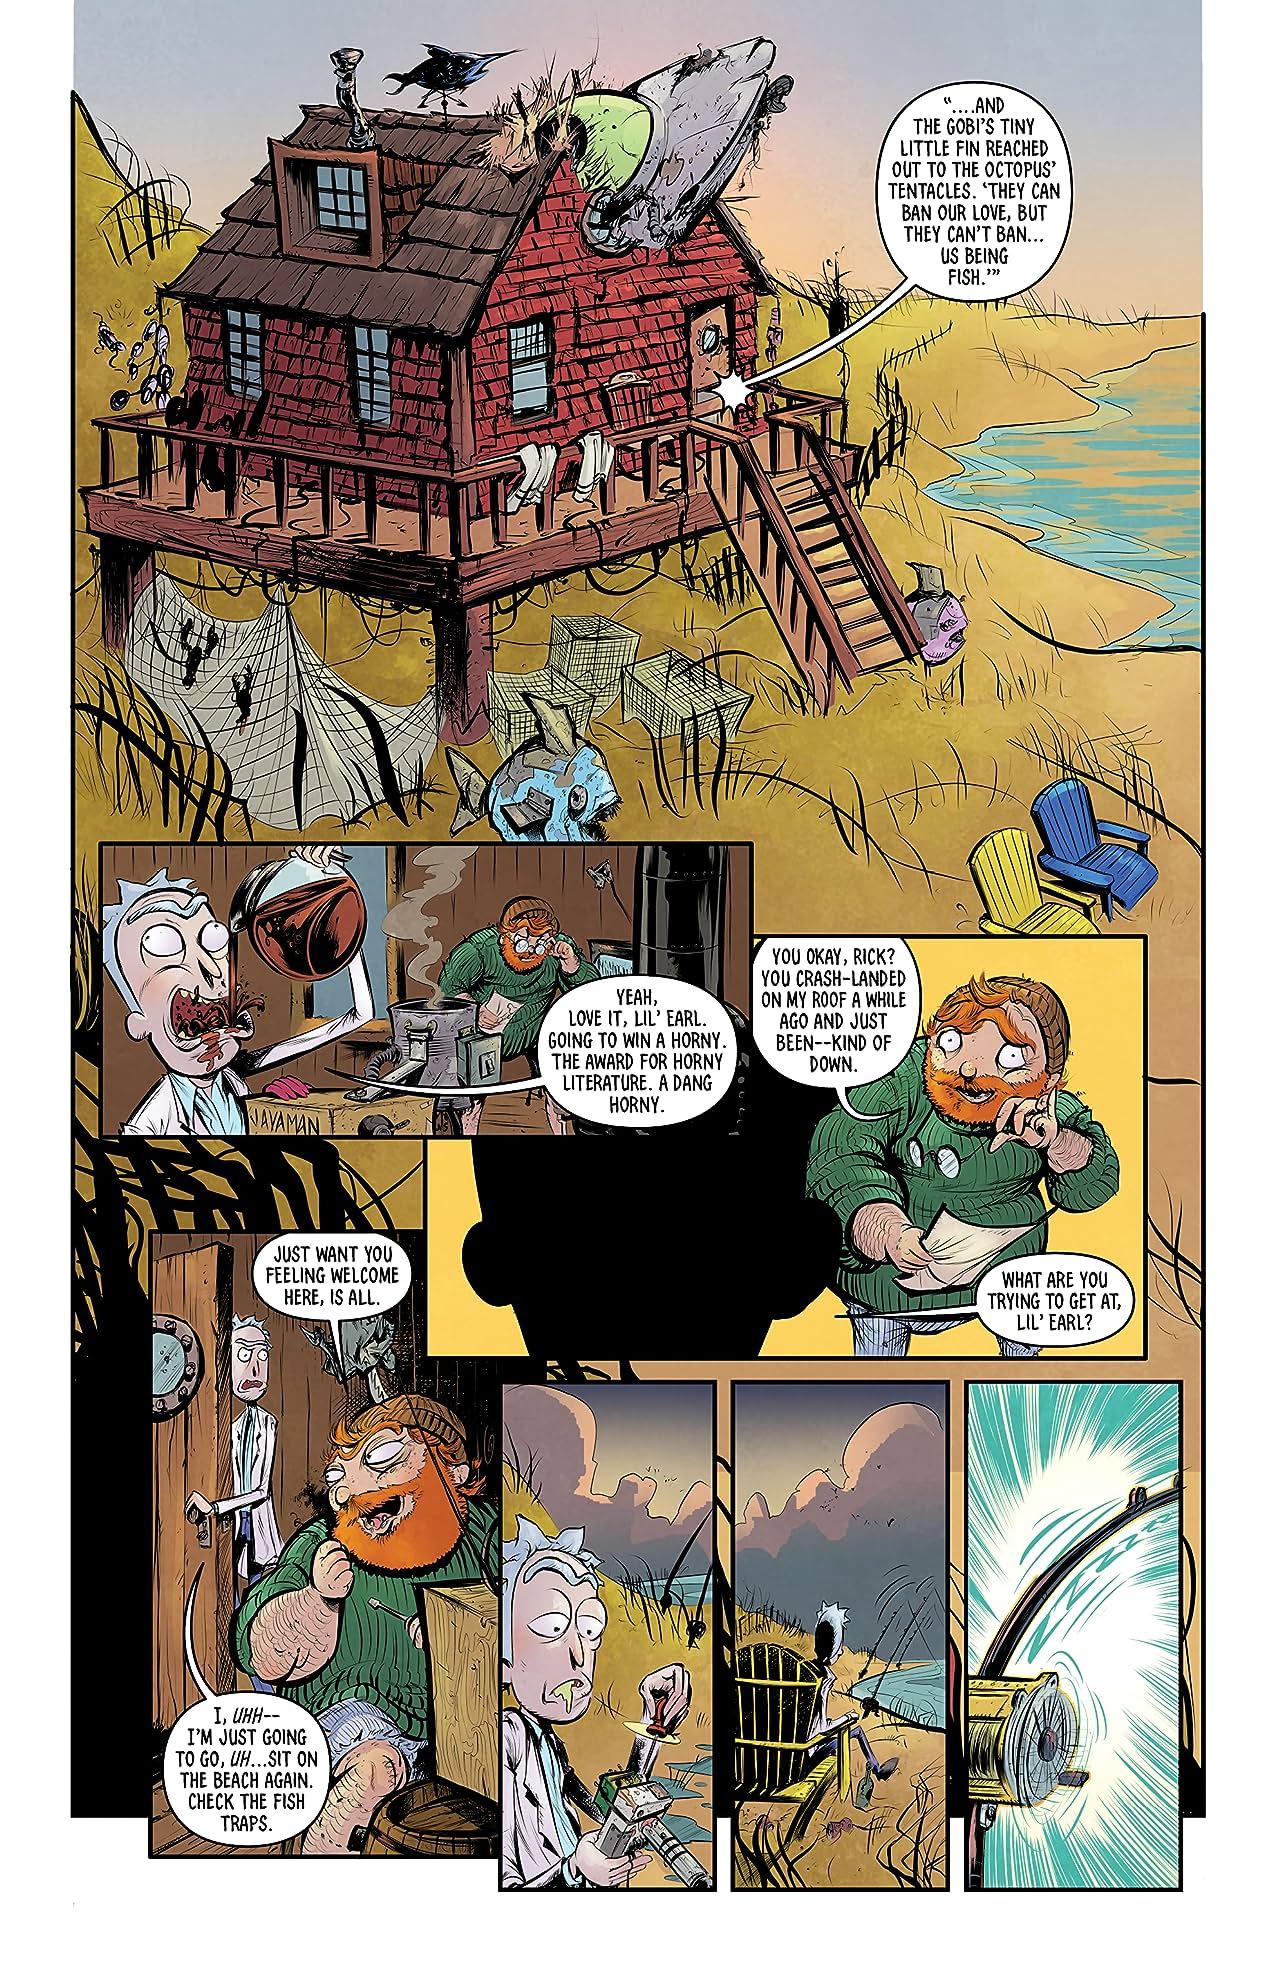 Rick and Morty #1: Mr. Nimbus